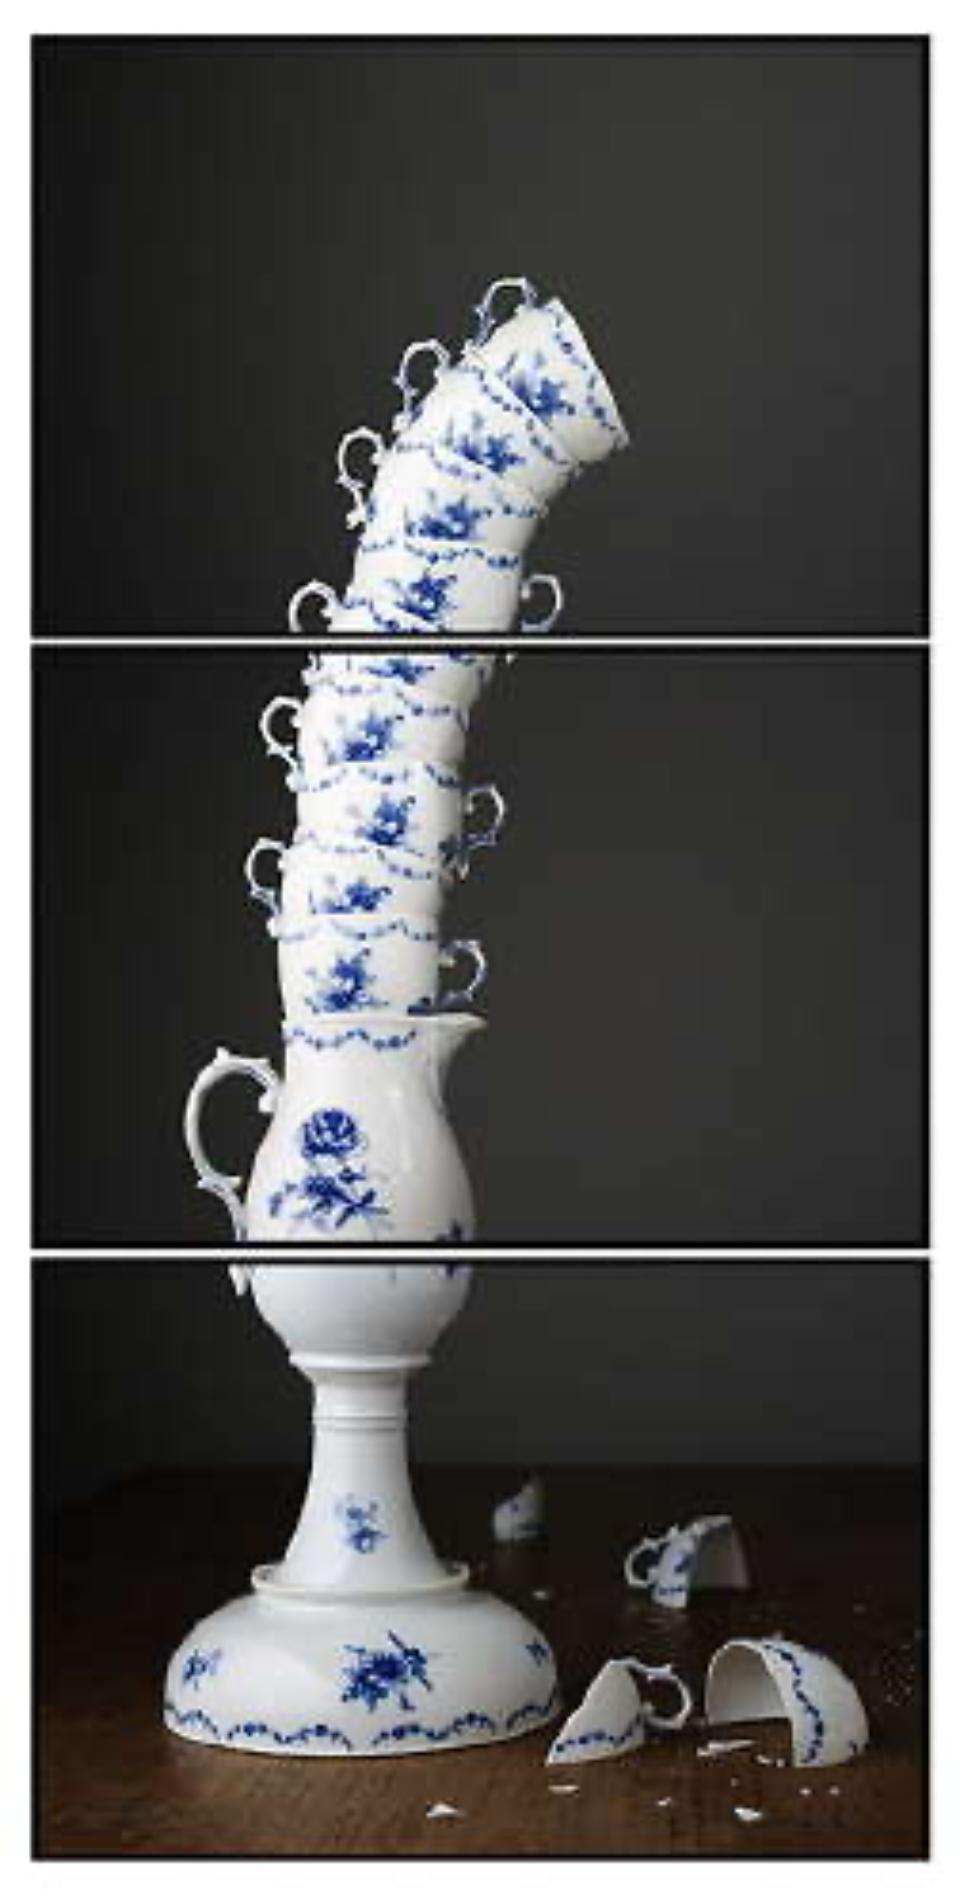 Joachim Froese: Archive #9 2008 3 archival pigment inkjet prints 93 x 46 cm Ed. 12